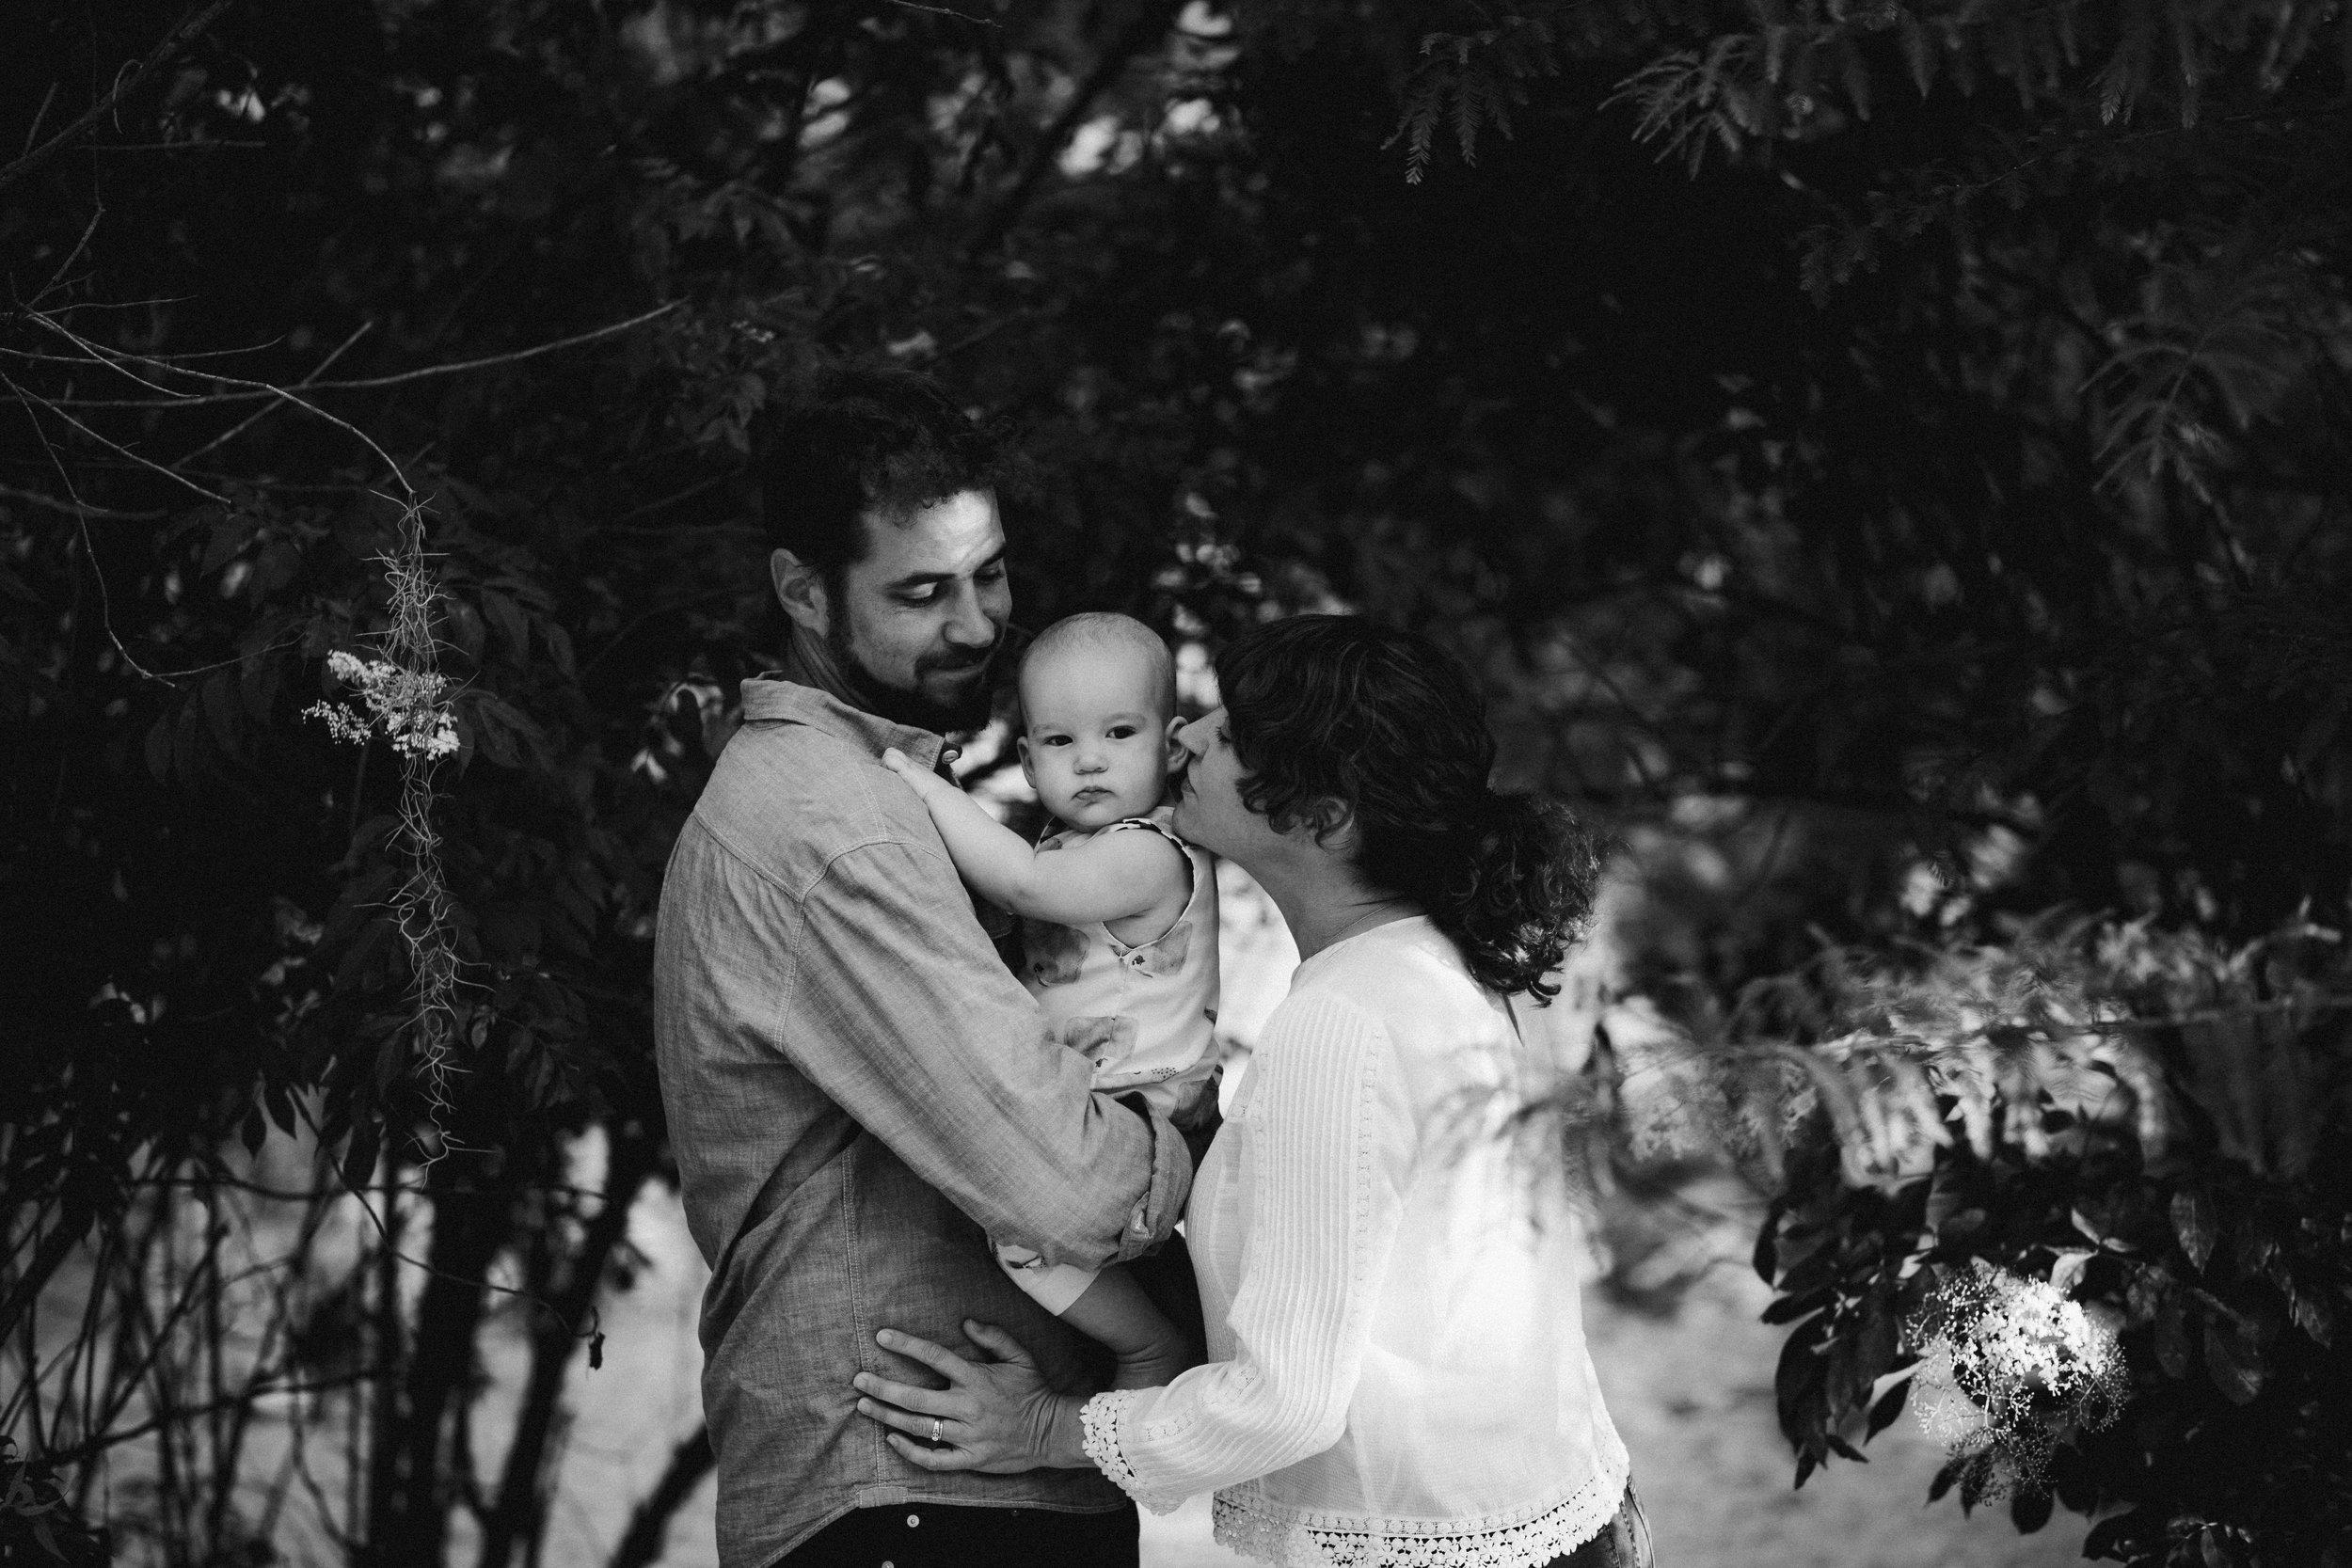 audubon park family shoot-sharon pye-27.jpg